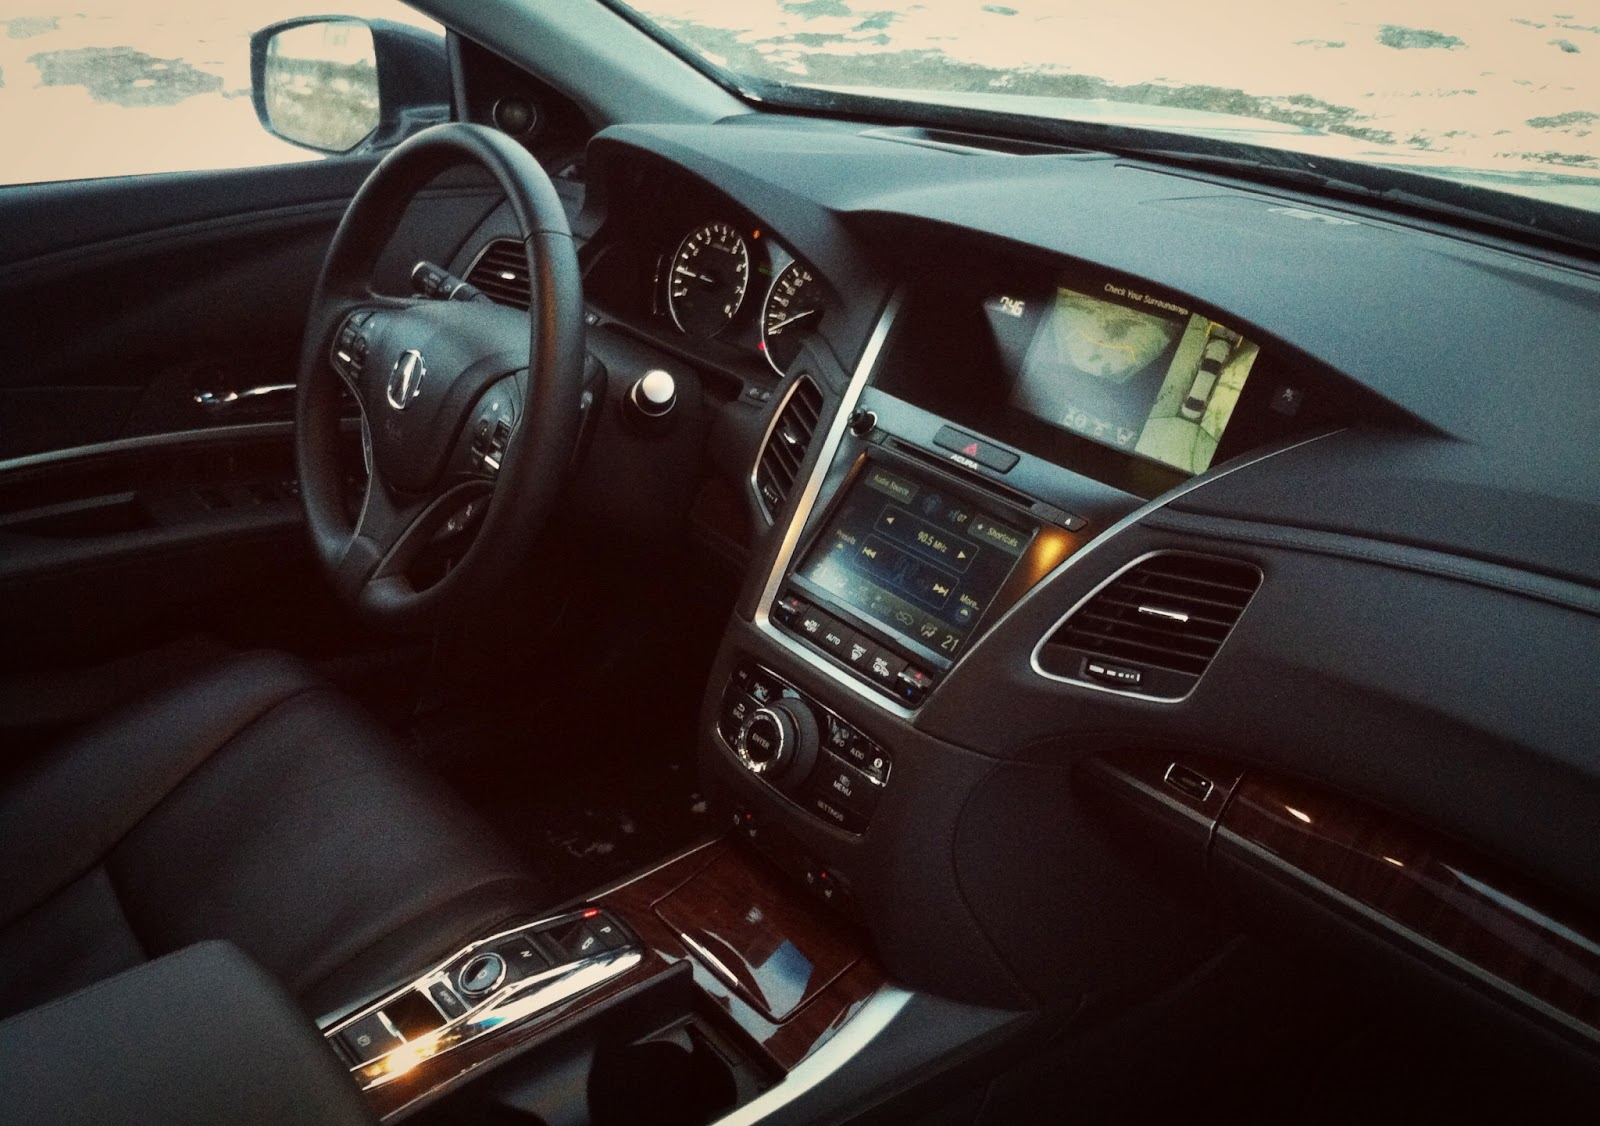 2015 Acura RLX Sport Hybrid interior